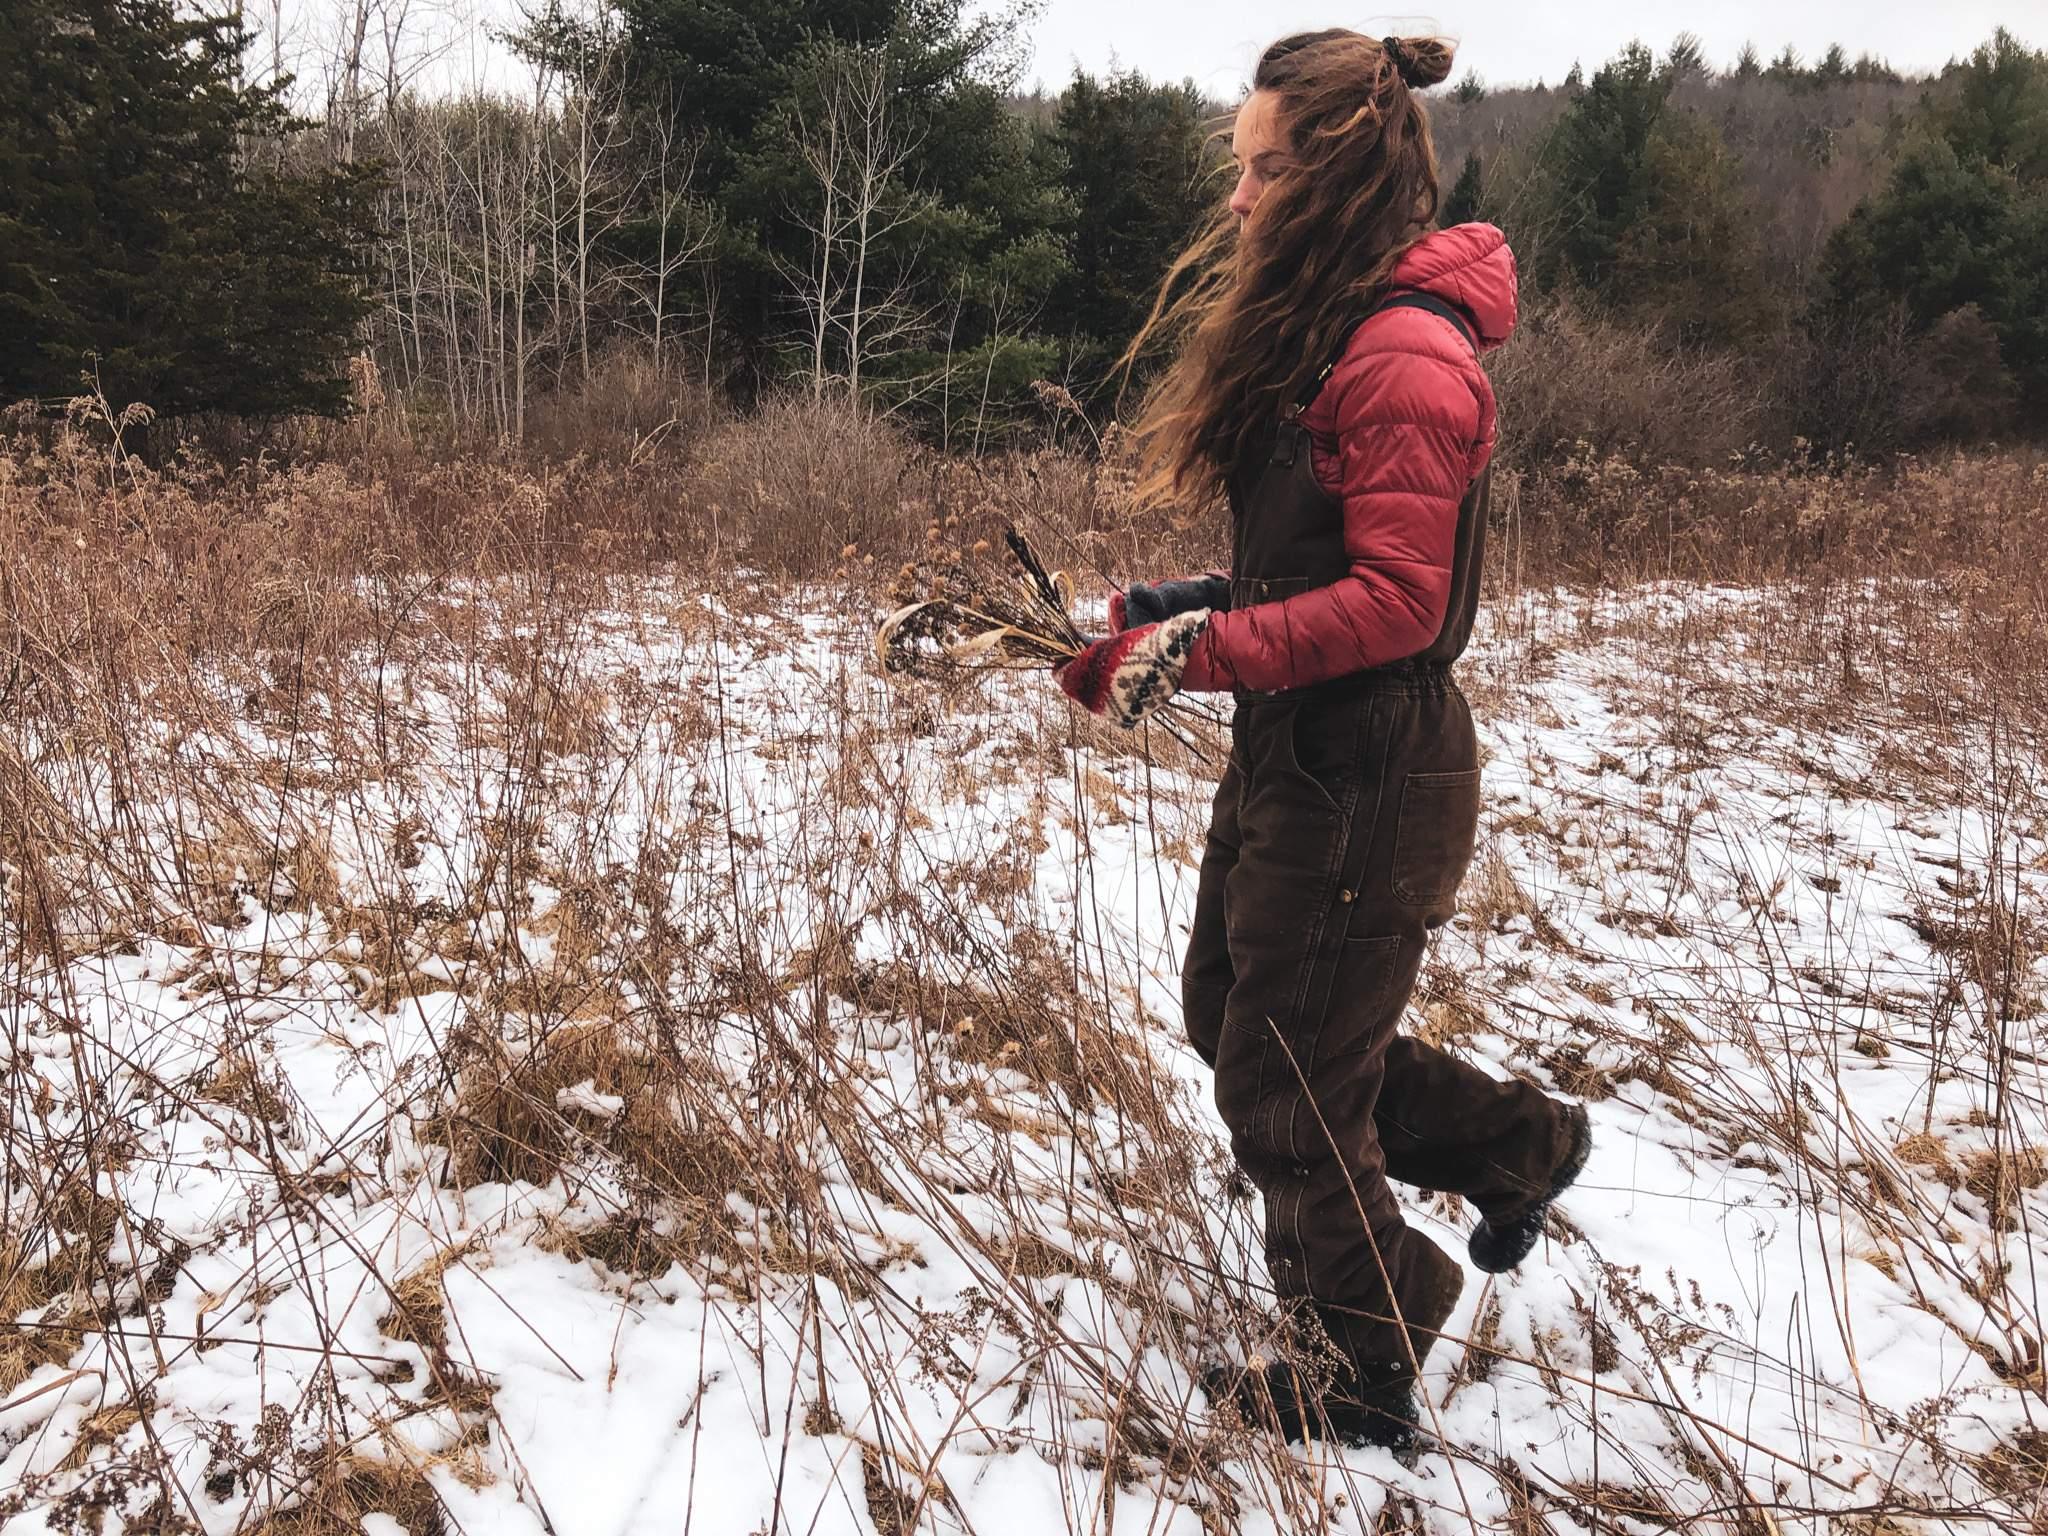 Woman walking in snowy pasture